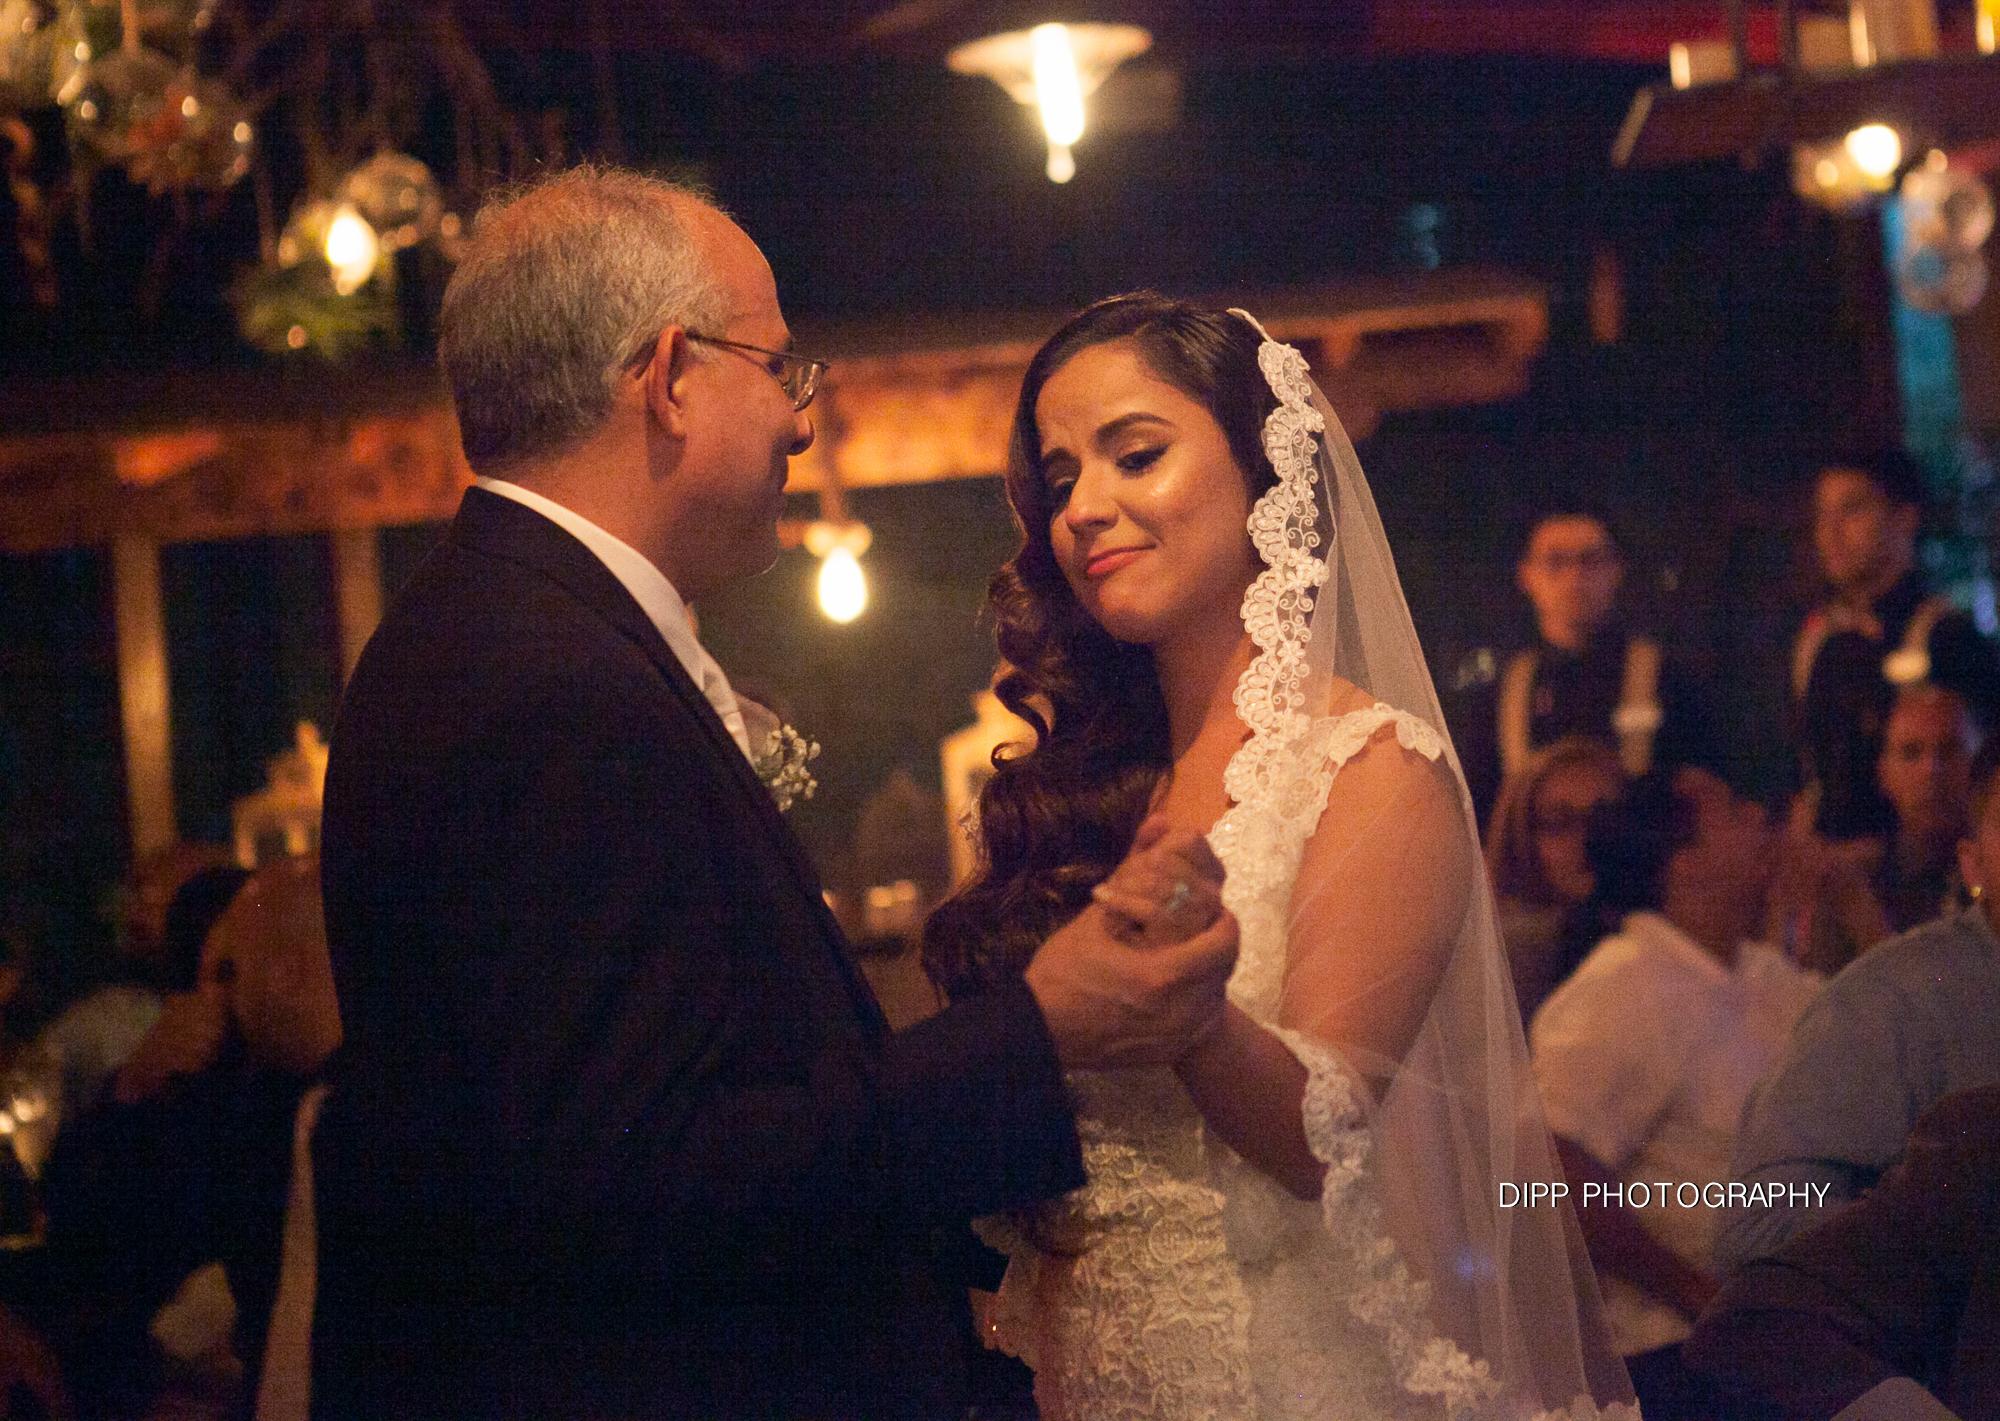 Dipp_2016 EDITED Melissa & Avilio Wedding-432